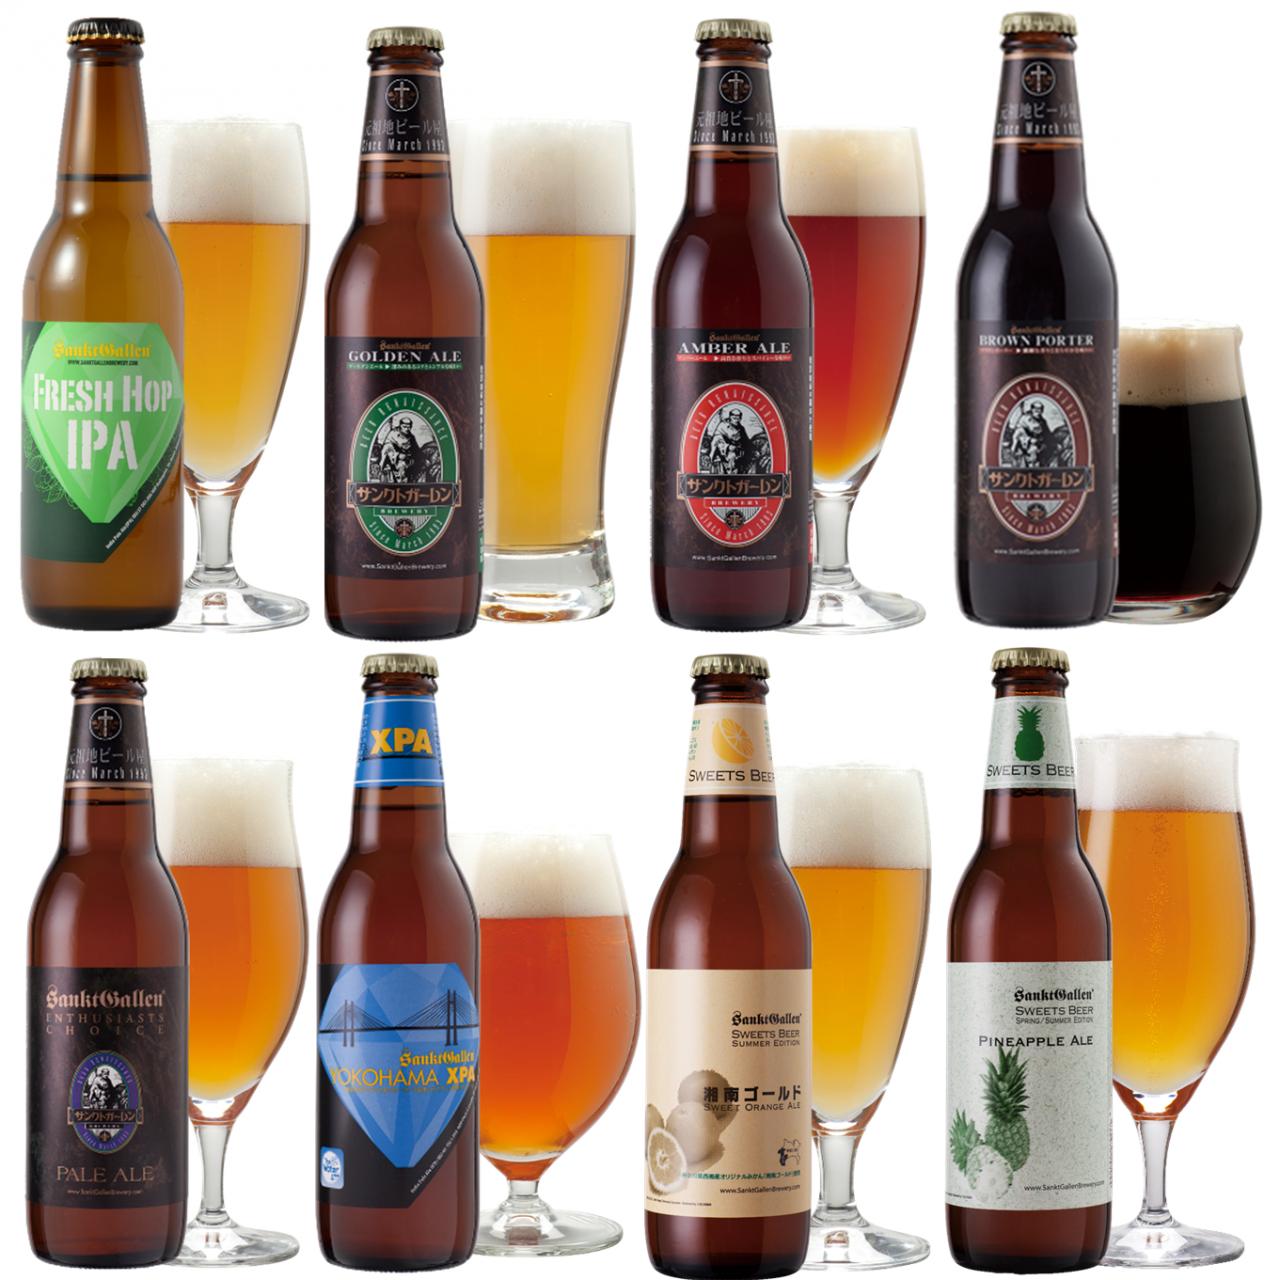 FRESH HOP IPA入 クラフトビール8種飲み比べセット